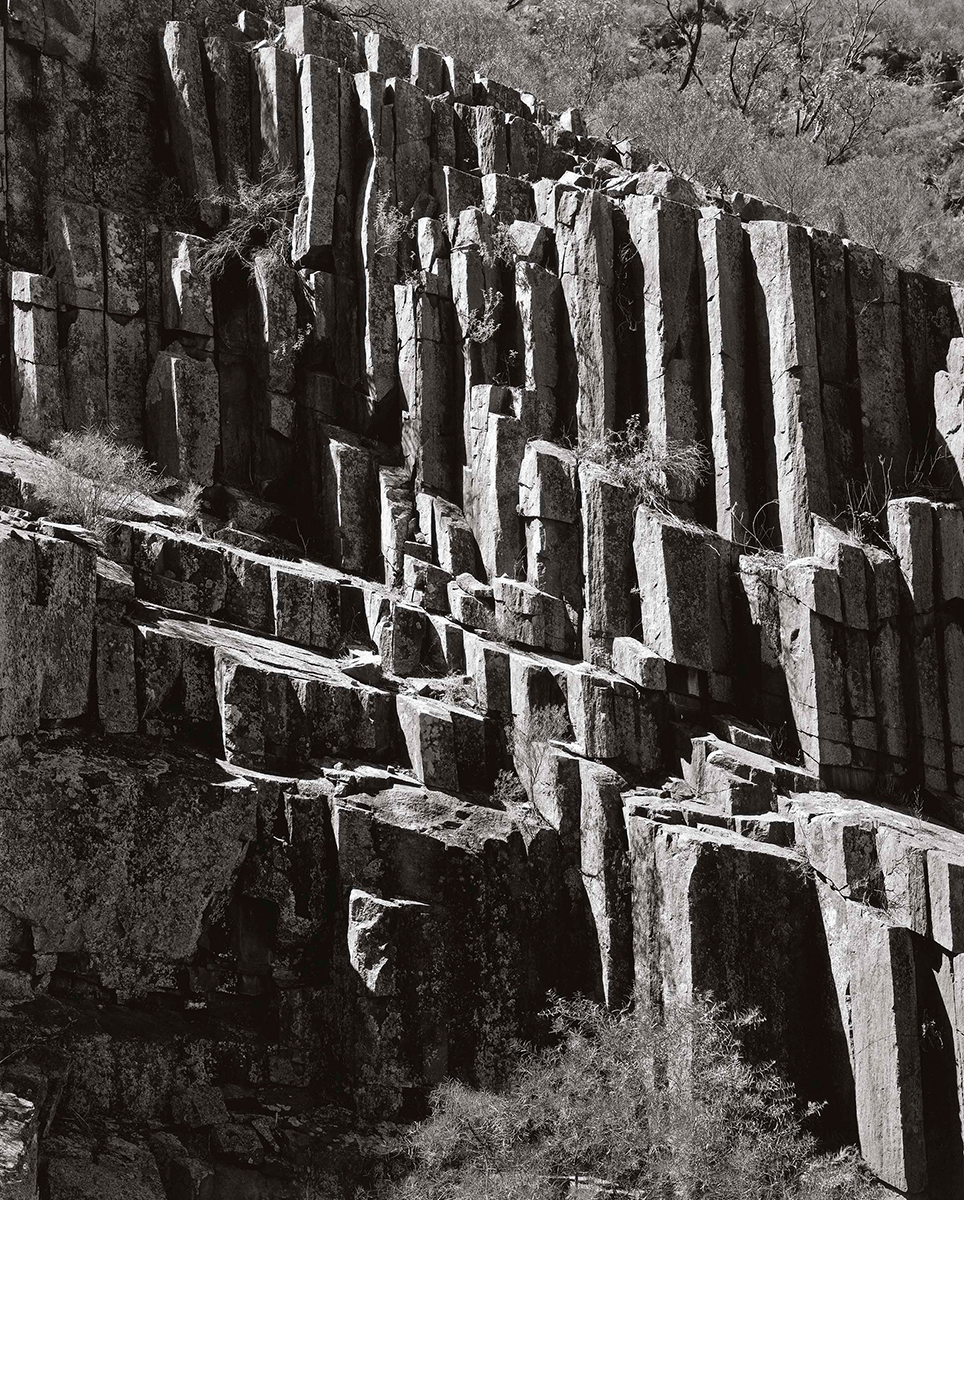 Rhyolite Rock Columns